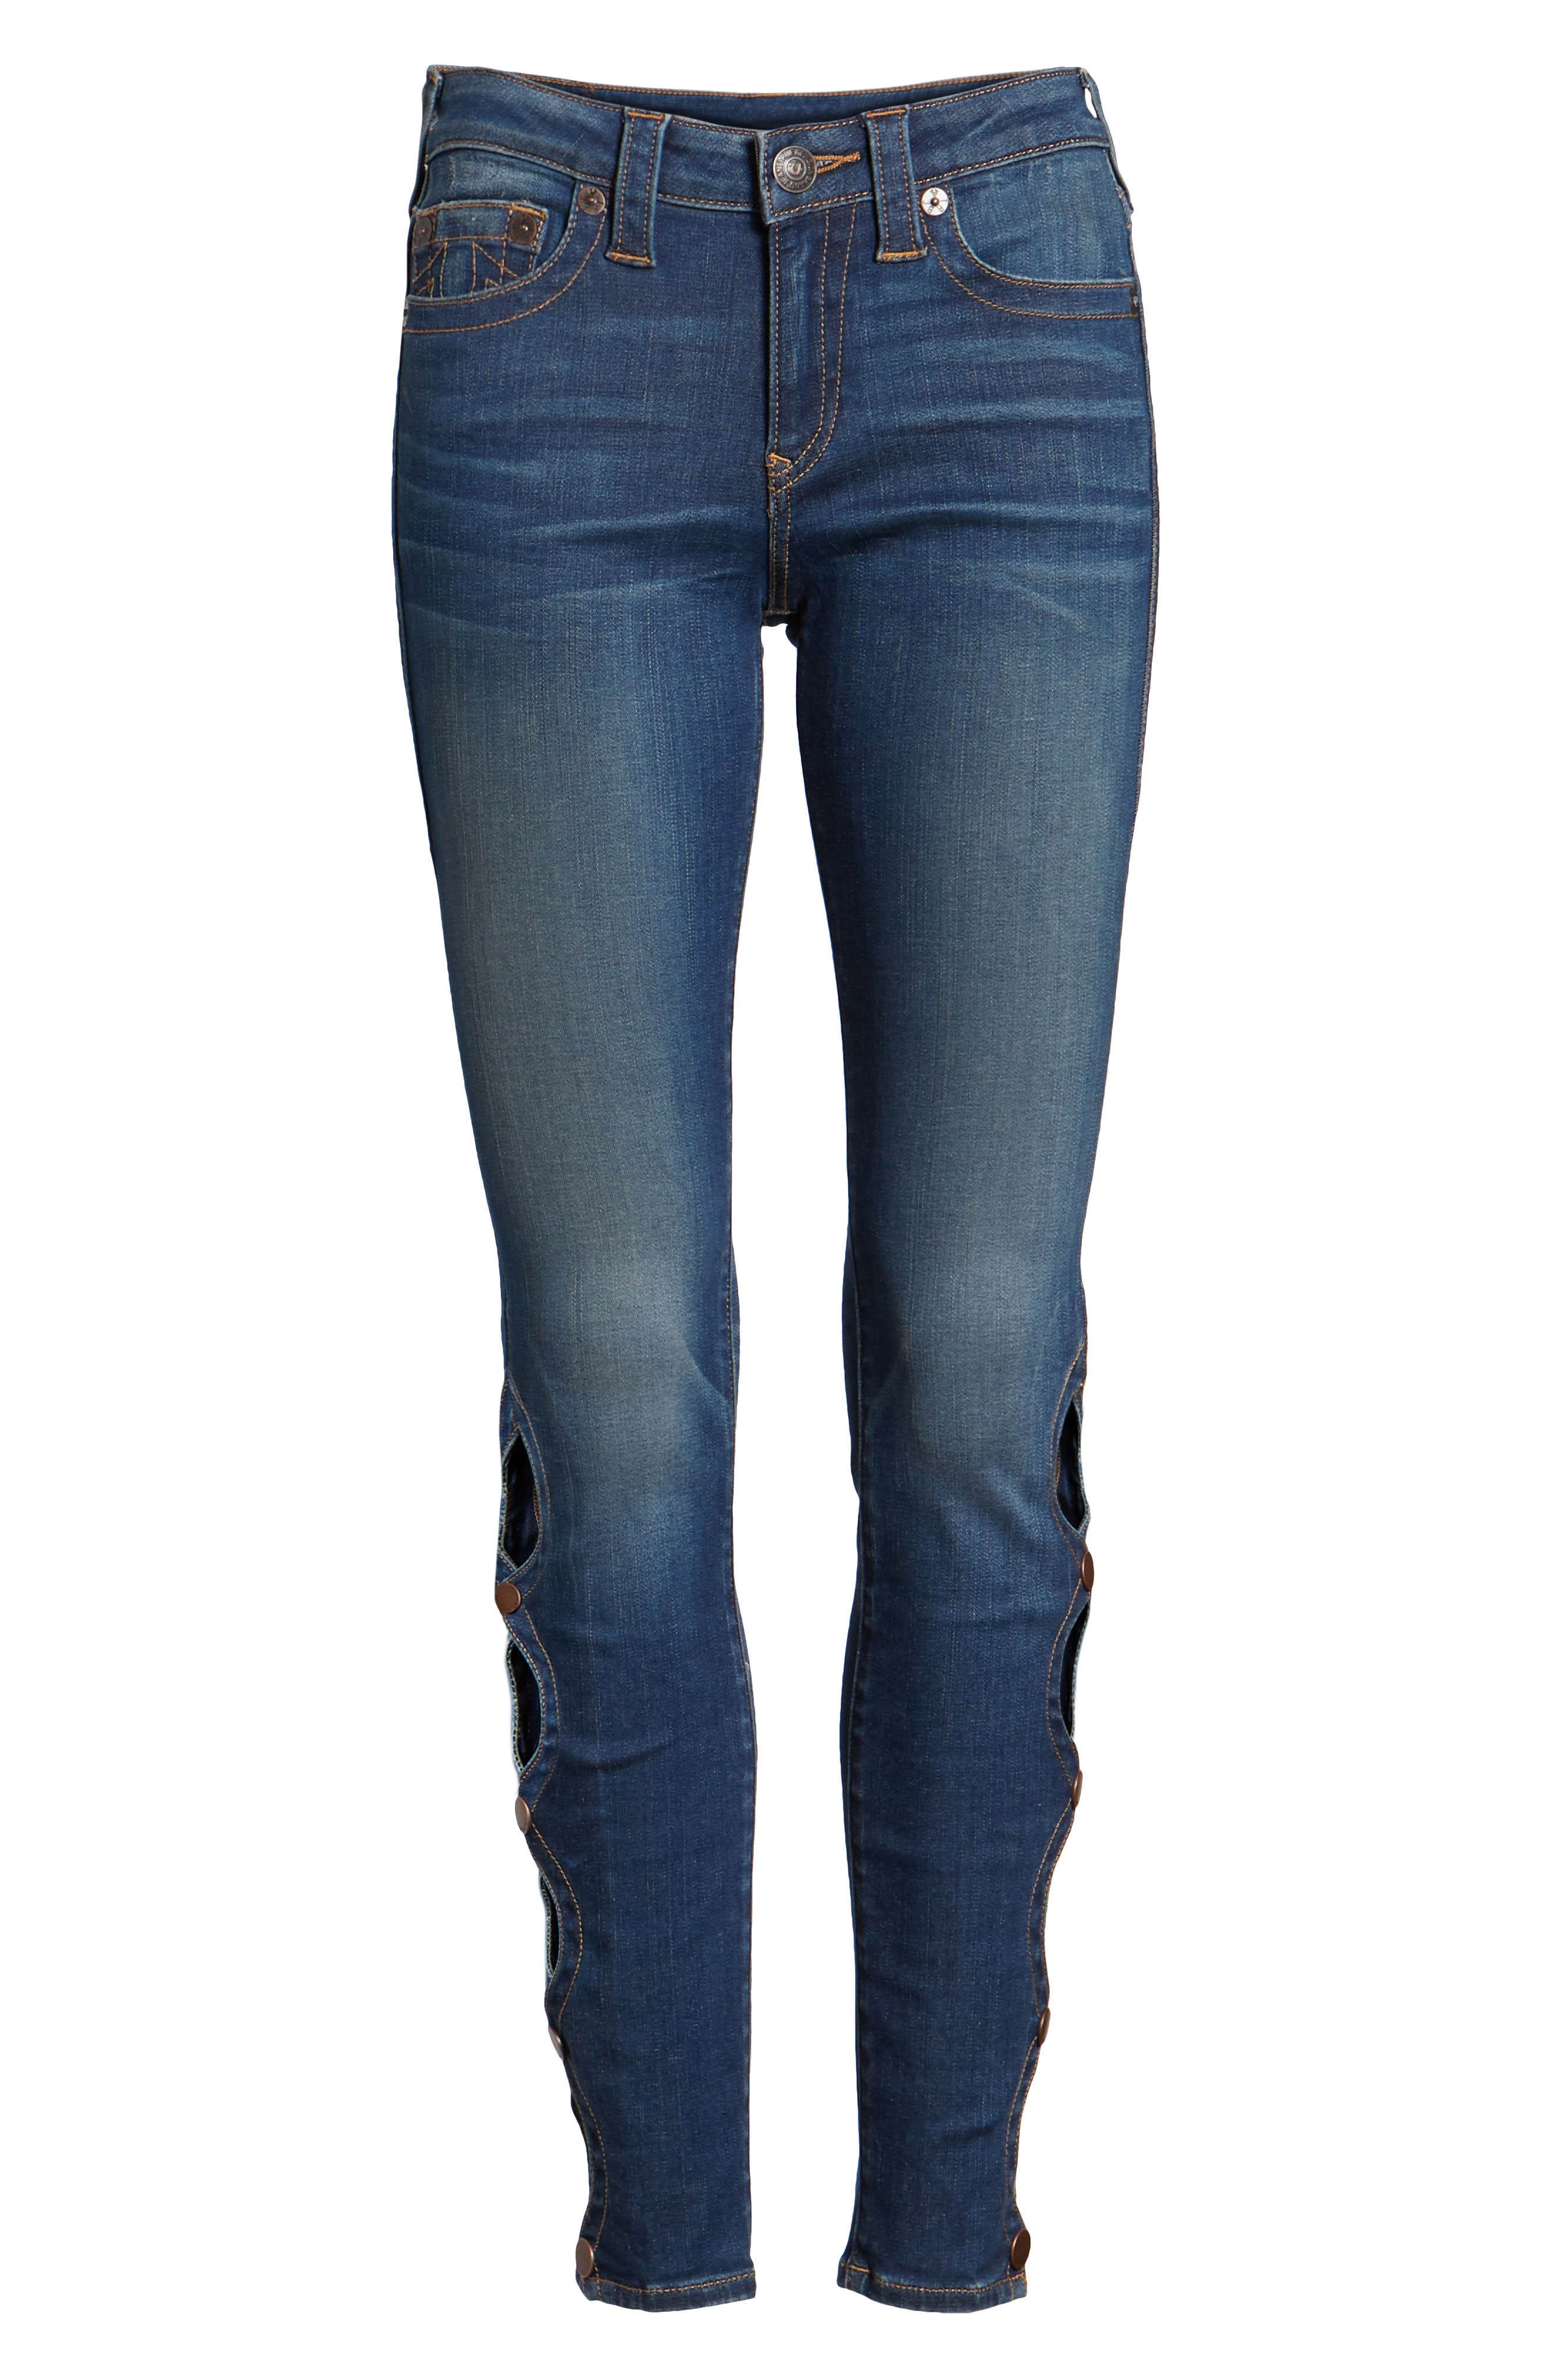 Halle Super Skinny Jeans,                             Alternate thumbnail 7, color,